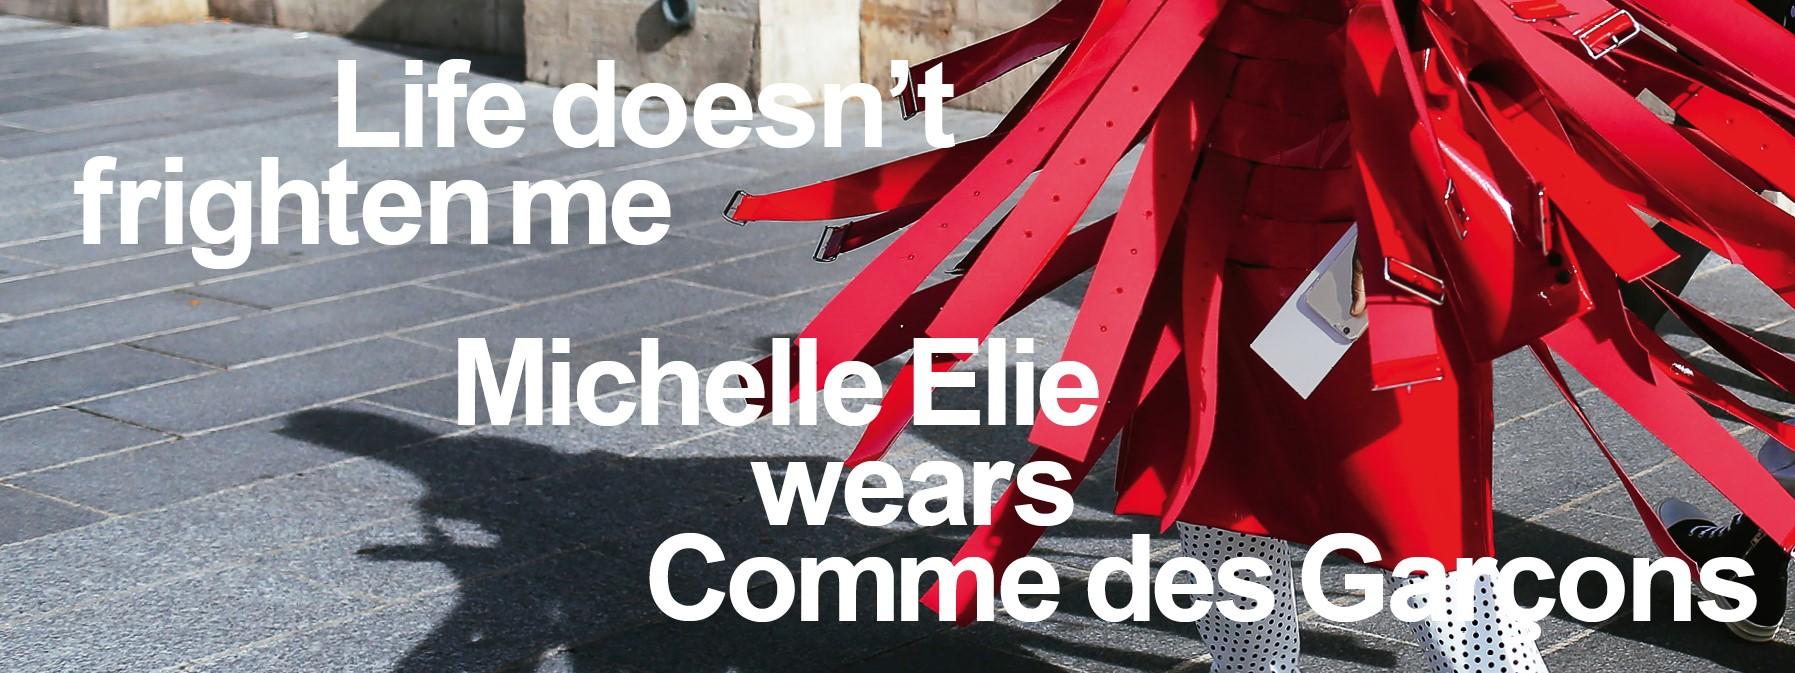 Michelle Elie wears Comme des Garçons: Ausstellung im MAK Frankfurt